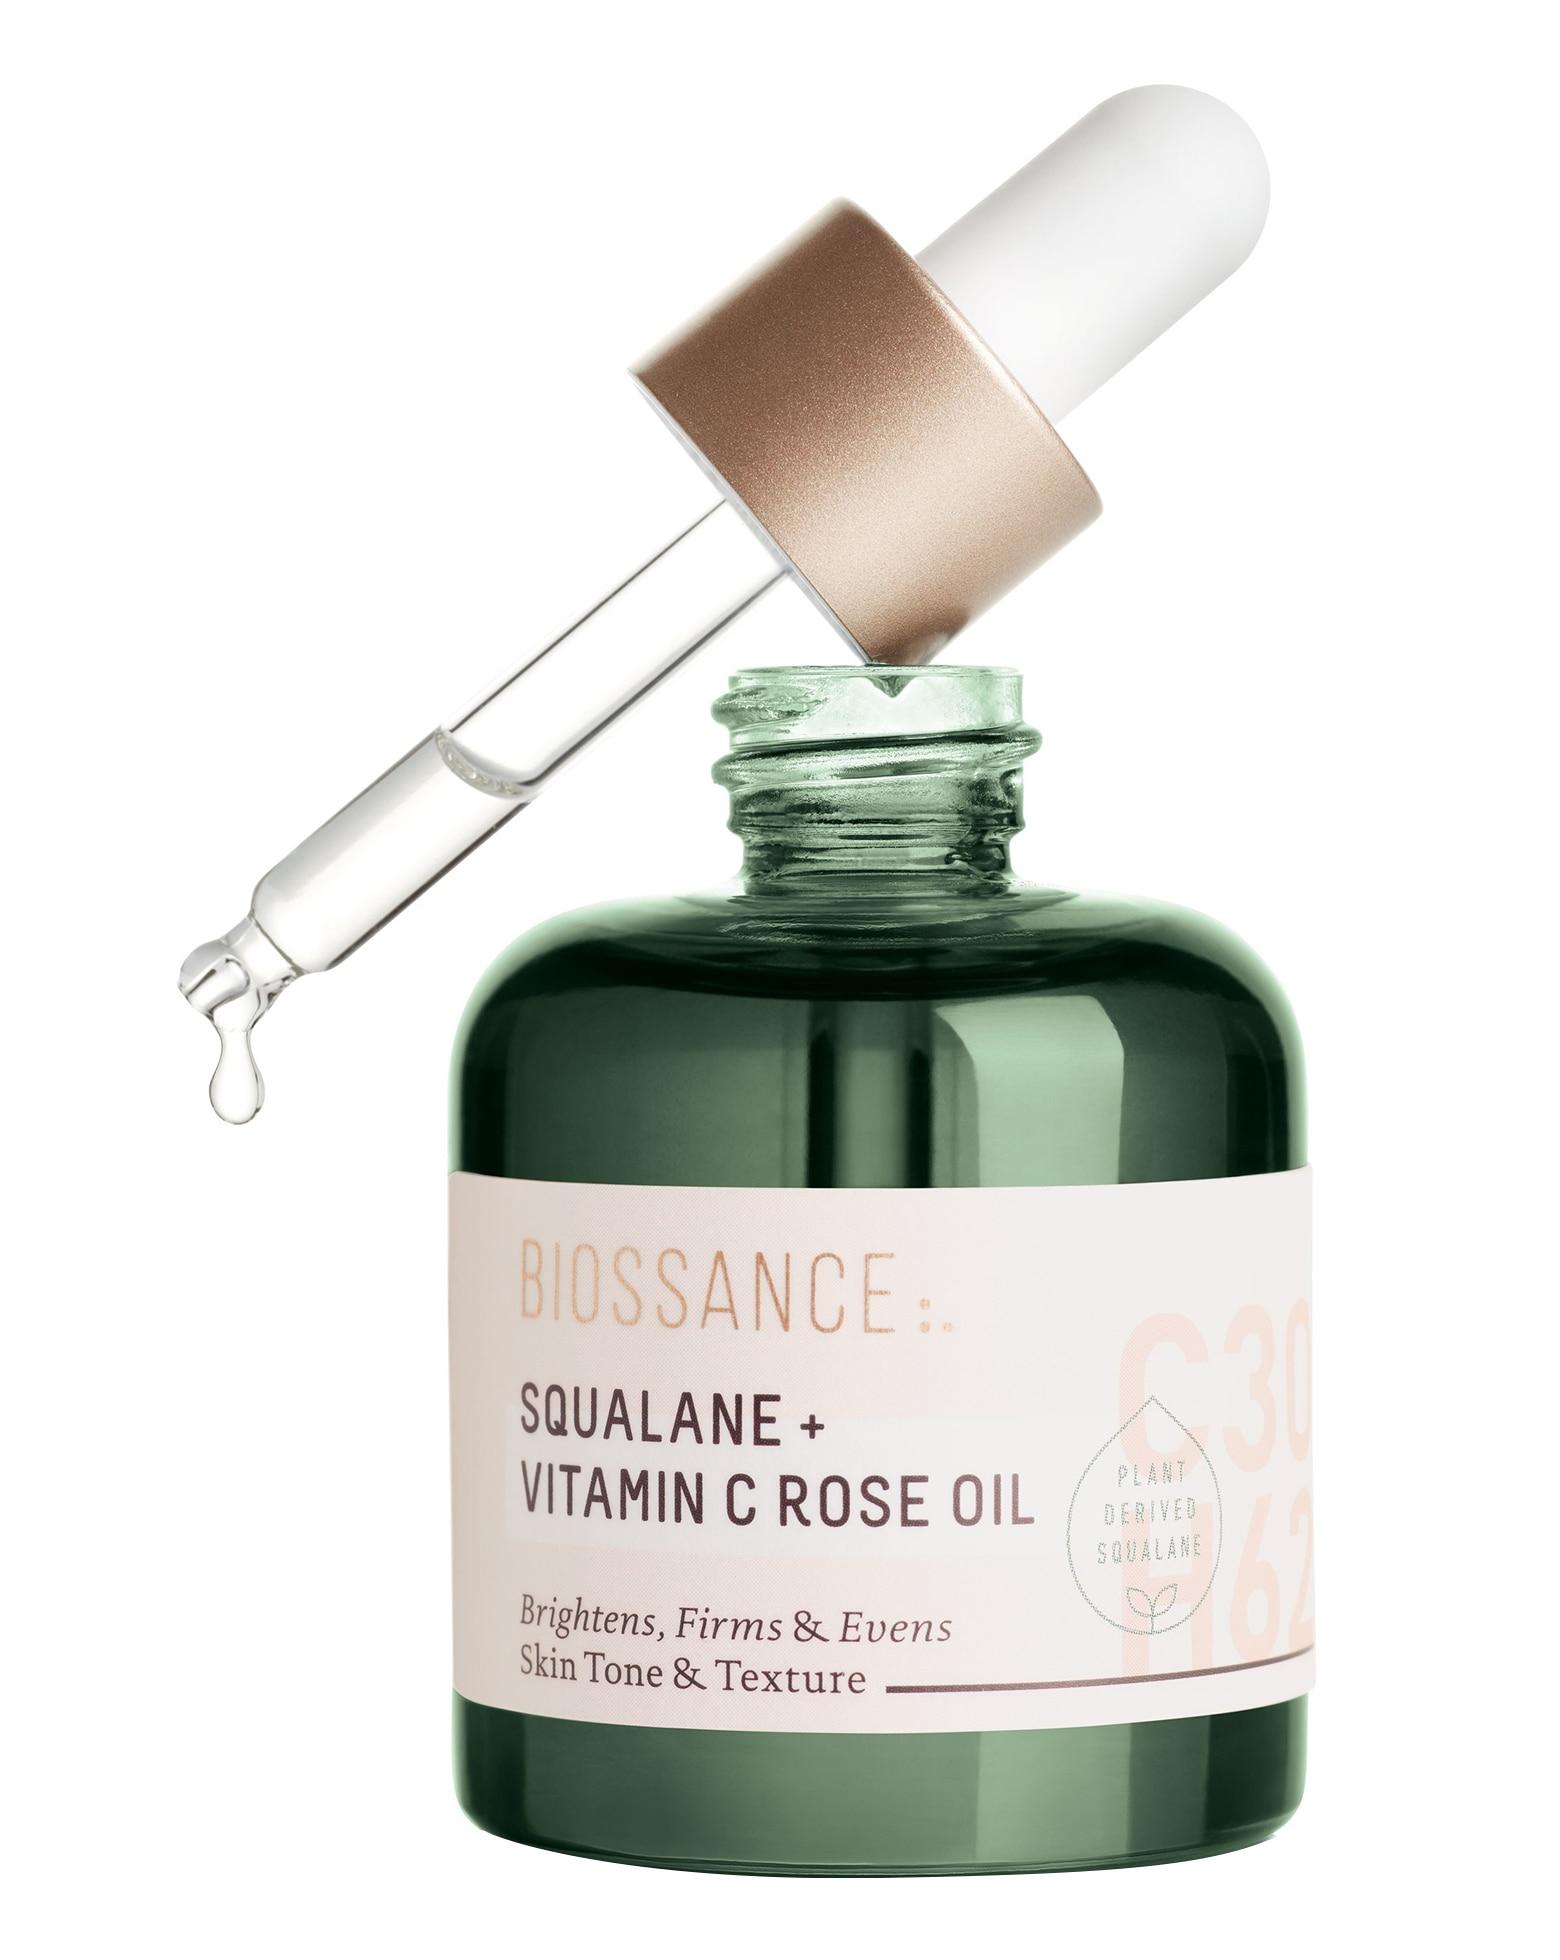 SQUALANE + VITAMIN C ROSE OIL 30ML (ESCUALANO + VITAMINA C Y ACEITE DE ROSAS)